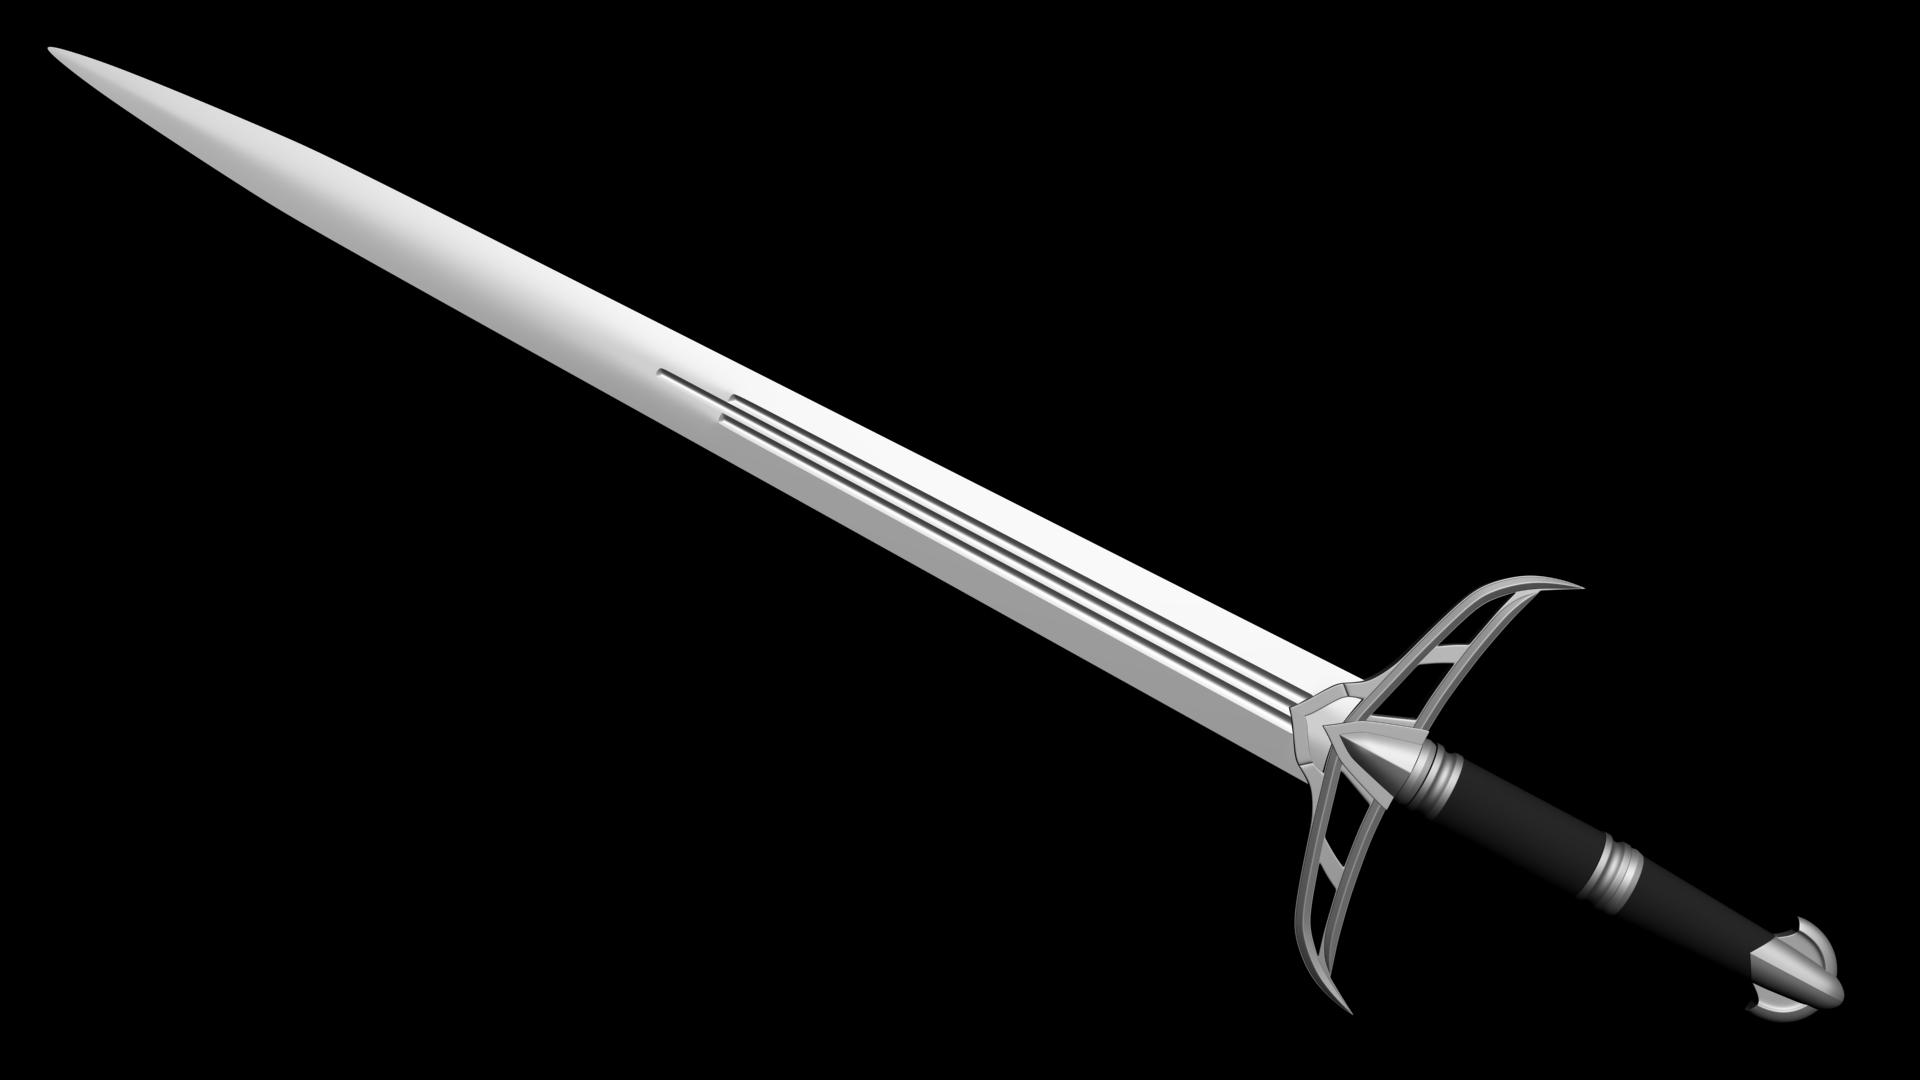 Sword PNG image - Sword PNG